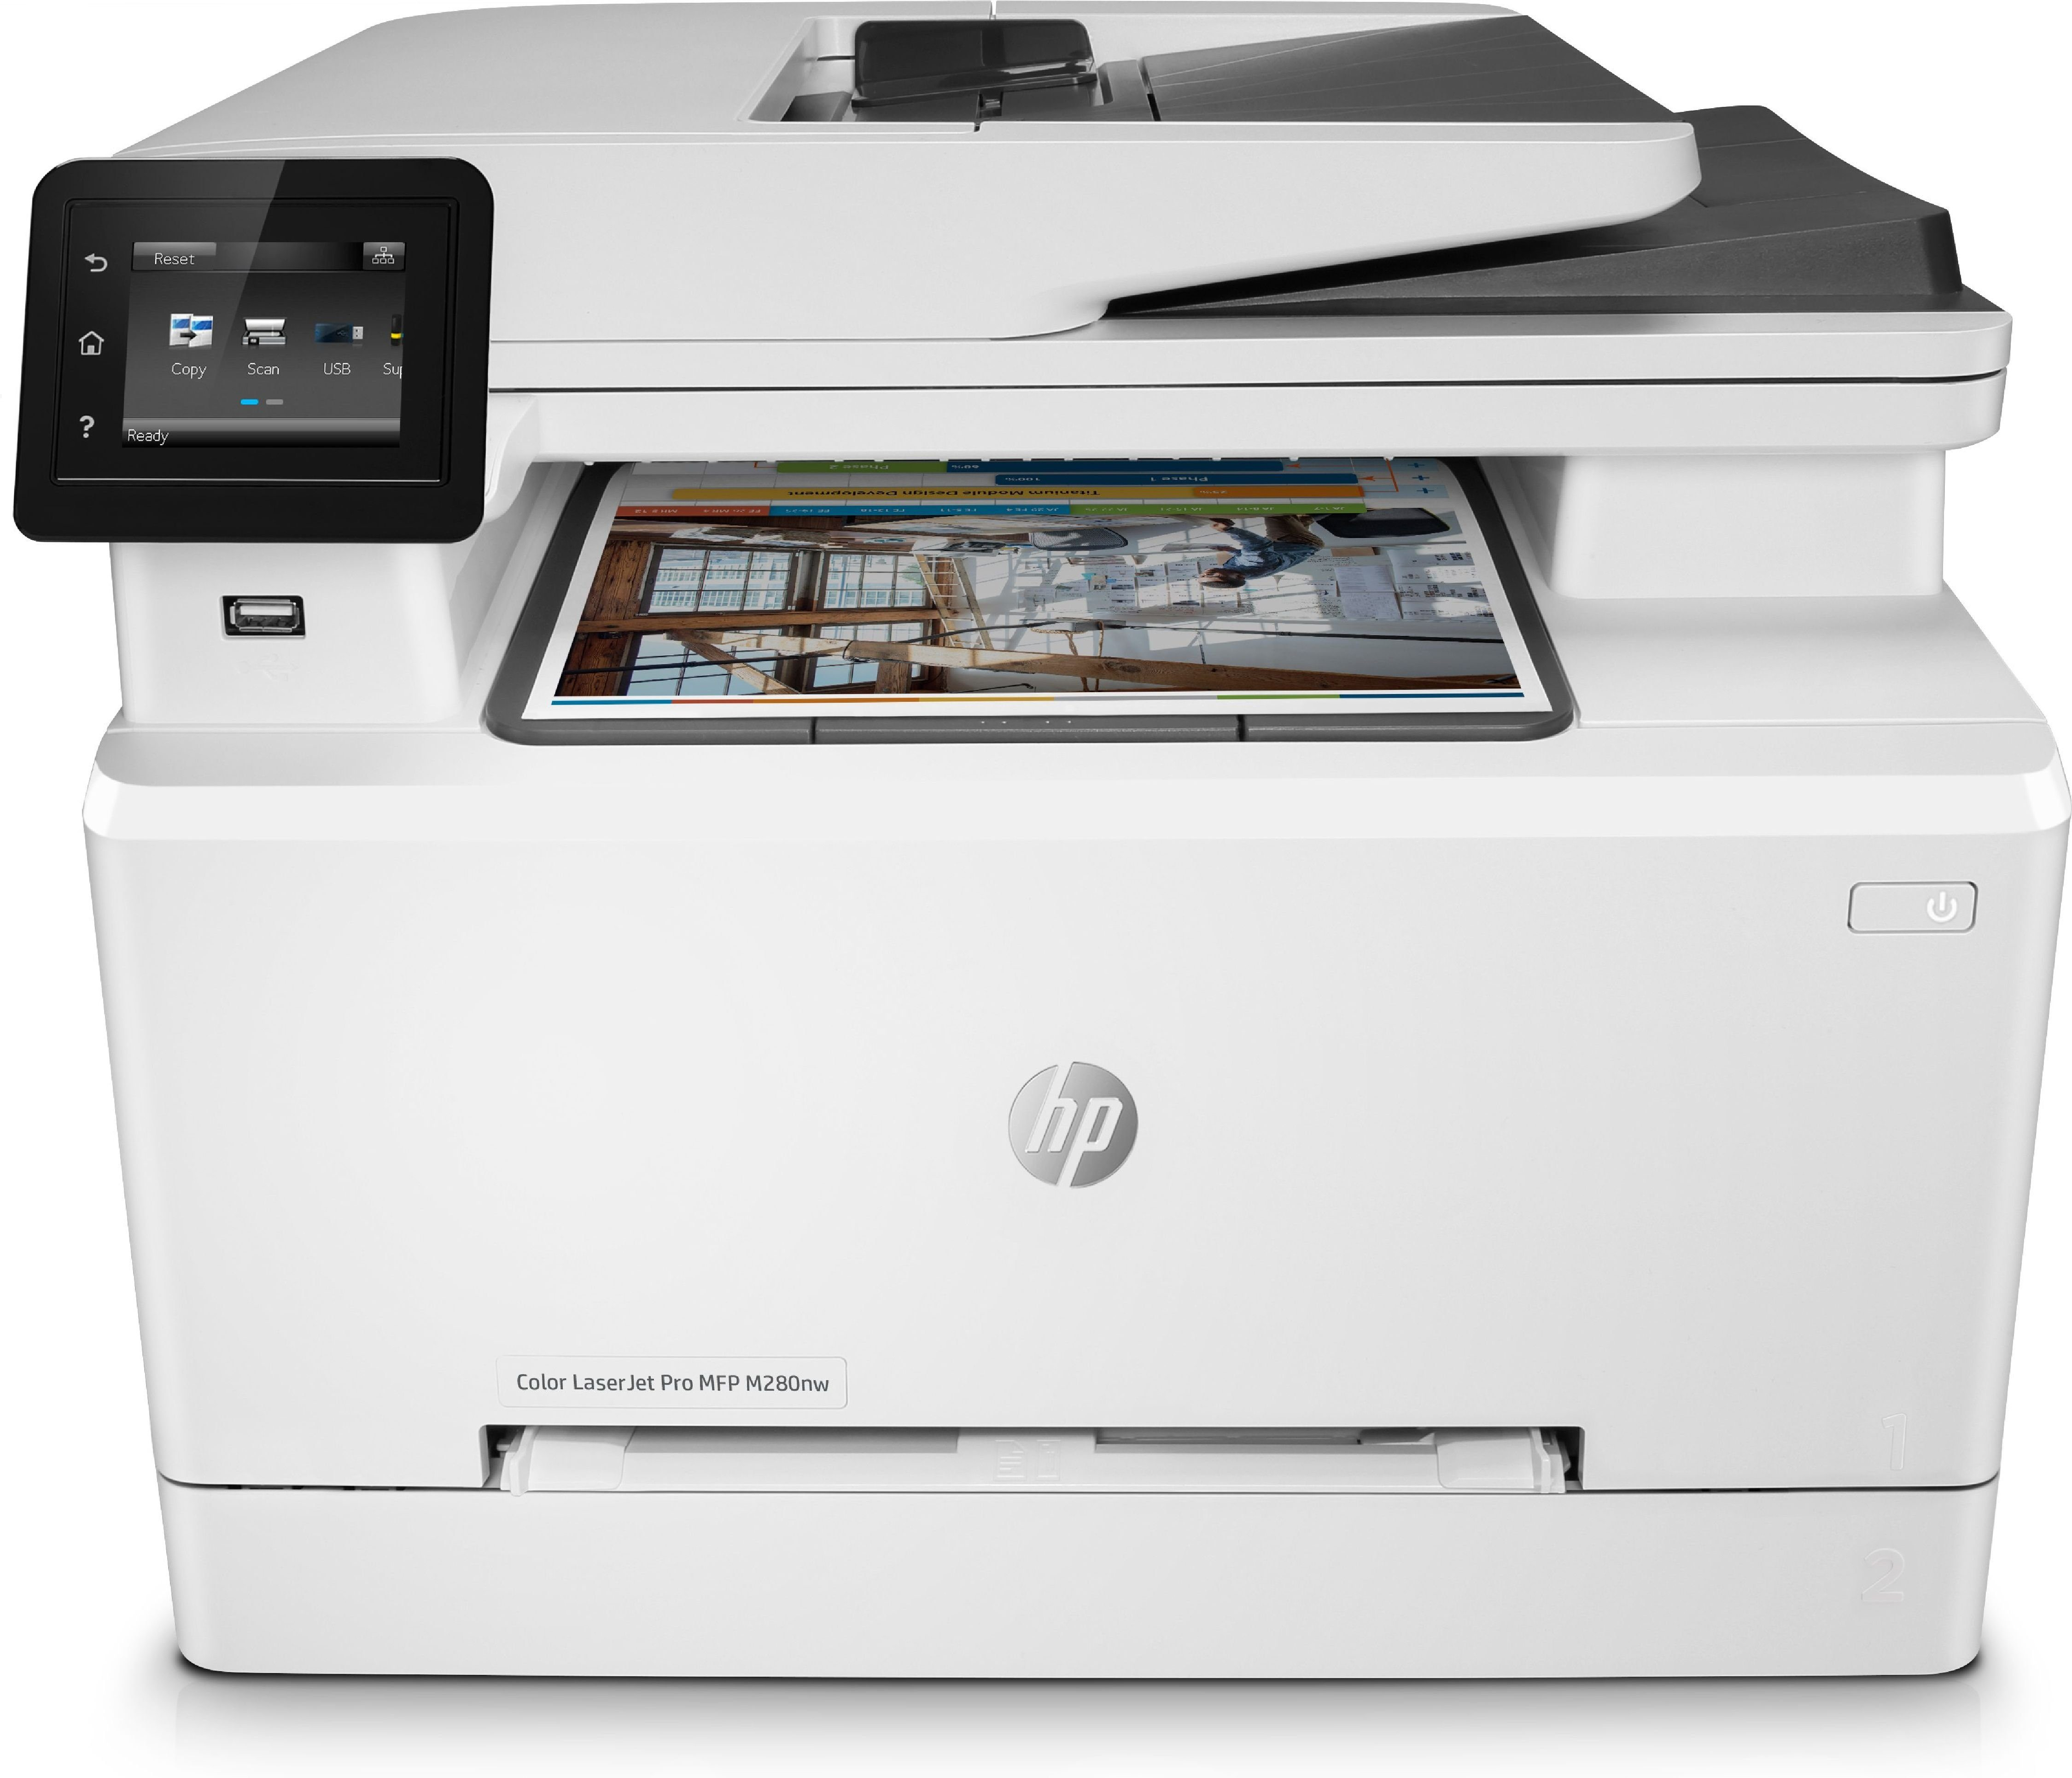 HP Color LaserJet Pro MFP M280nw Drucker »Drucken, Kopieren und Scannen«